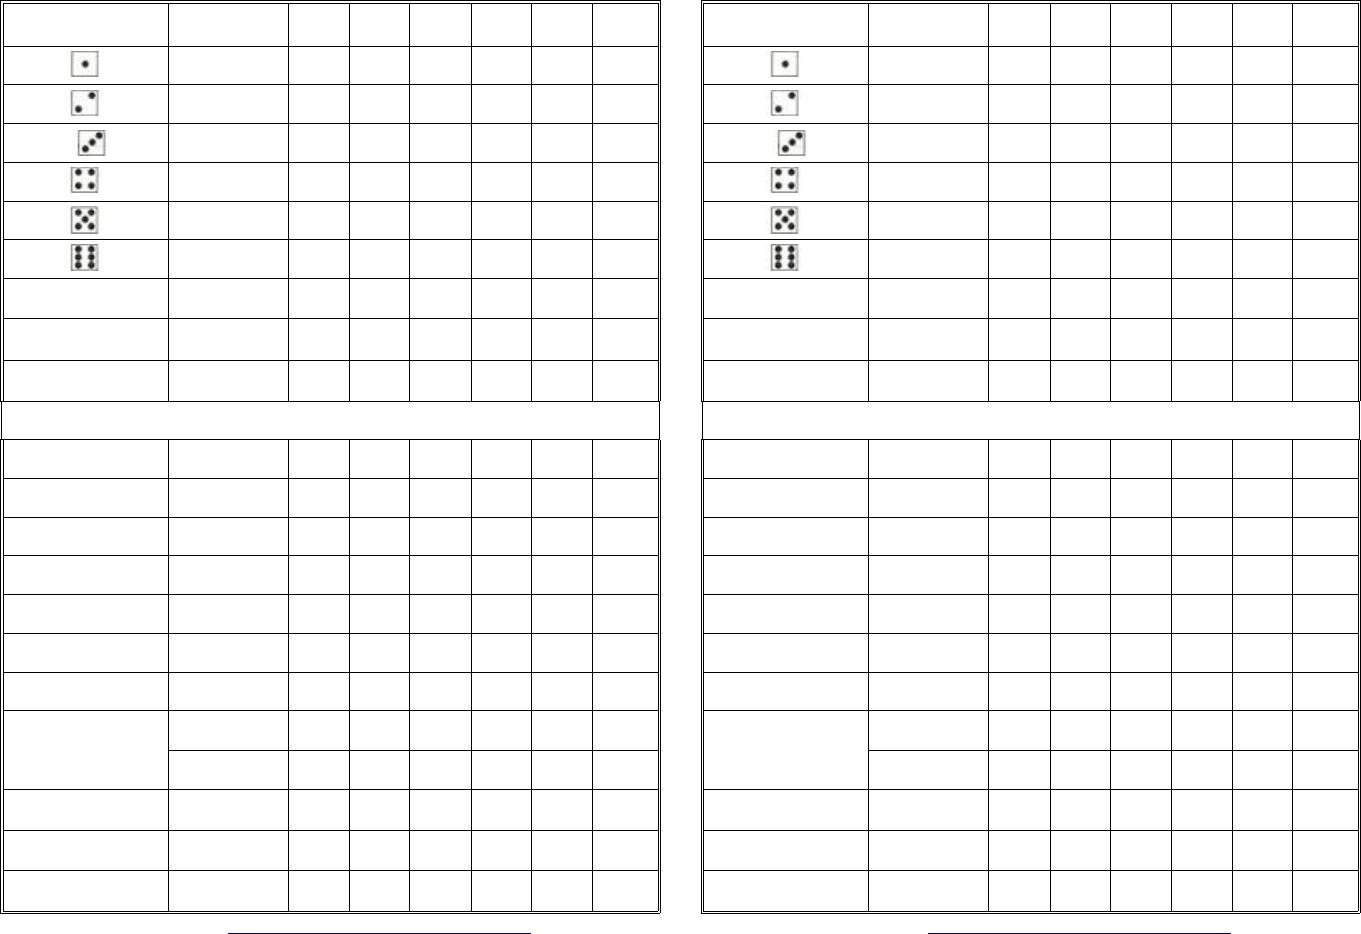 Yahtzee Score Sheets  Games    Scores And Free